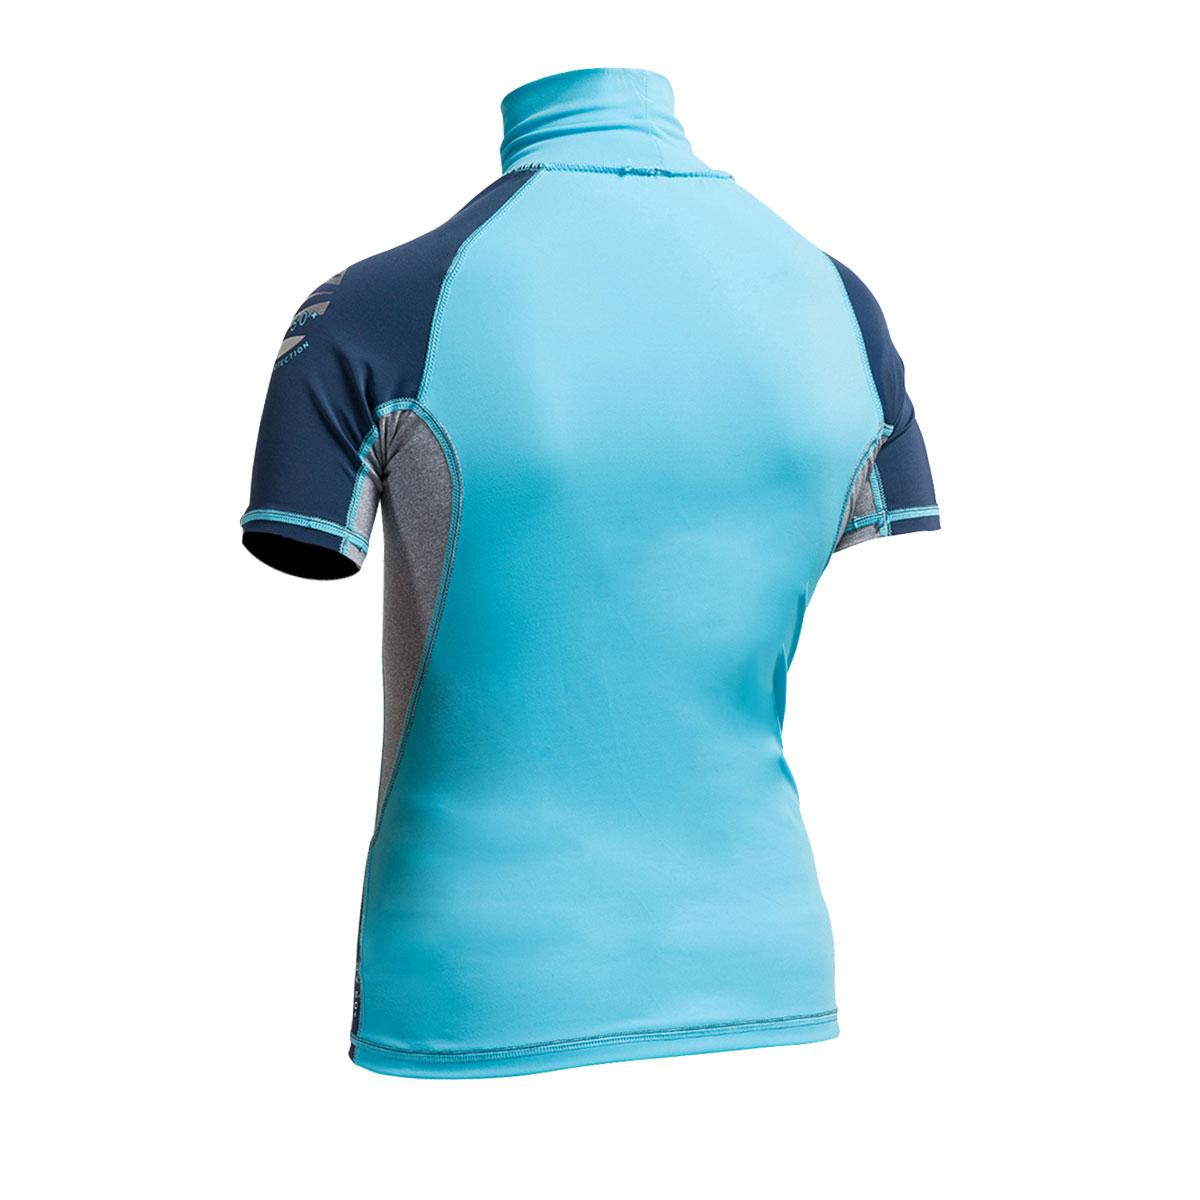 Turquoise//Pink Gul Junior Flatlock UV Protection Sunsuit 2020